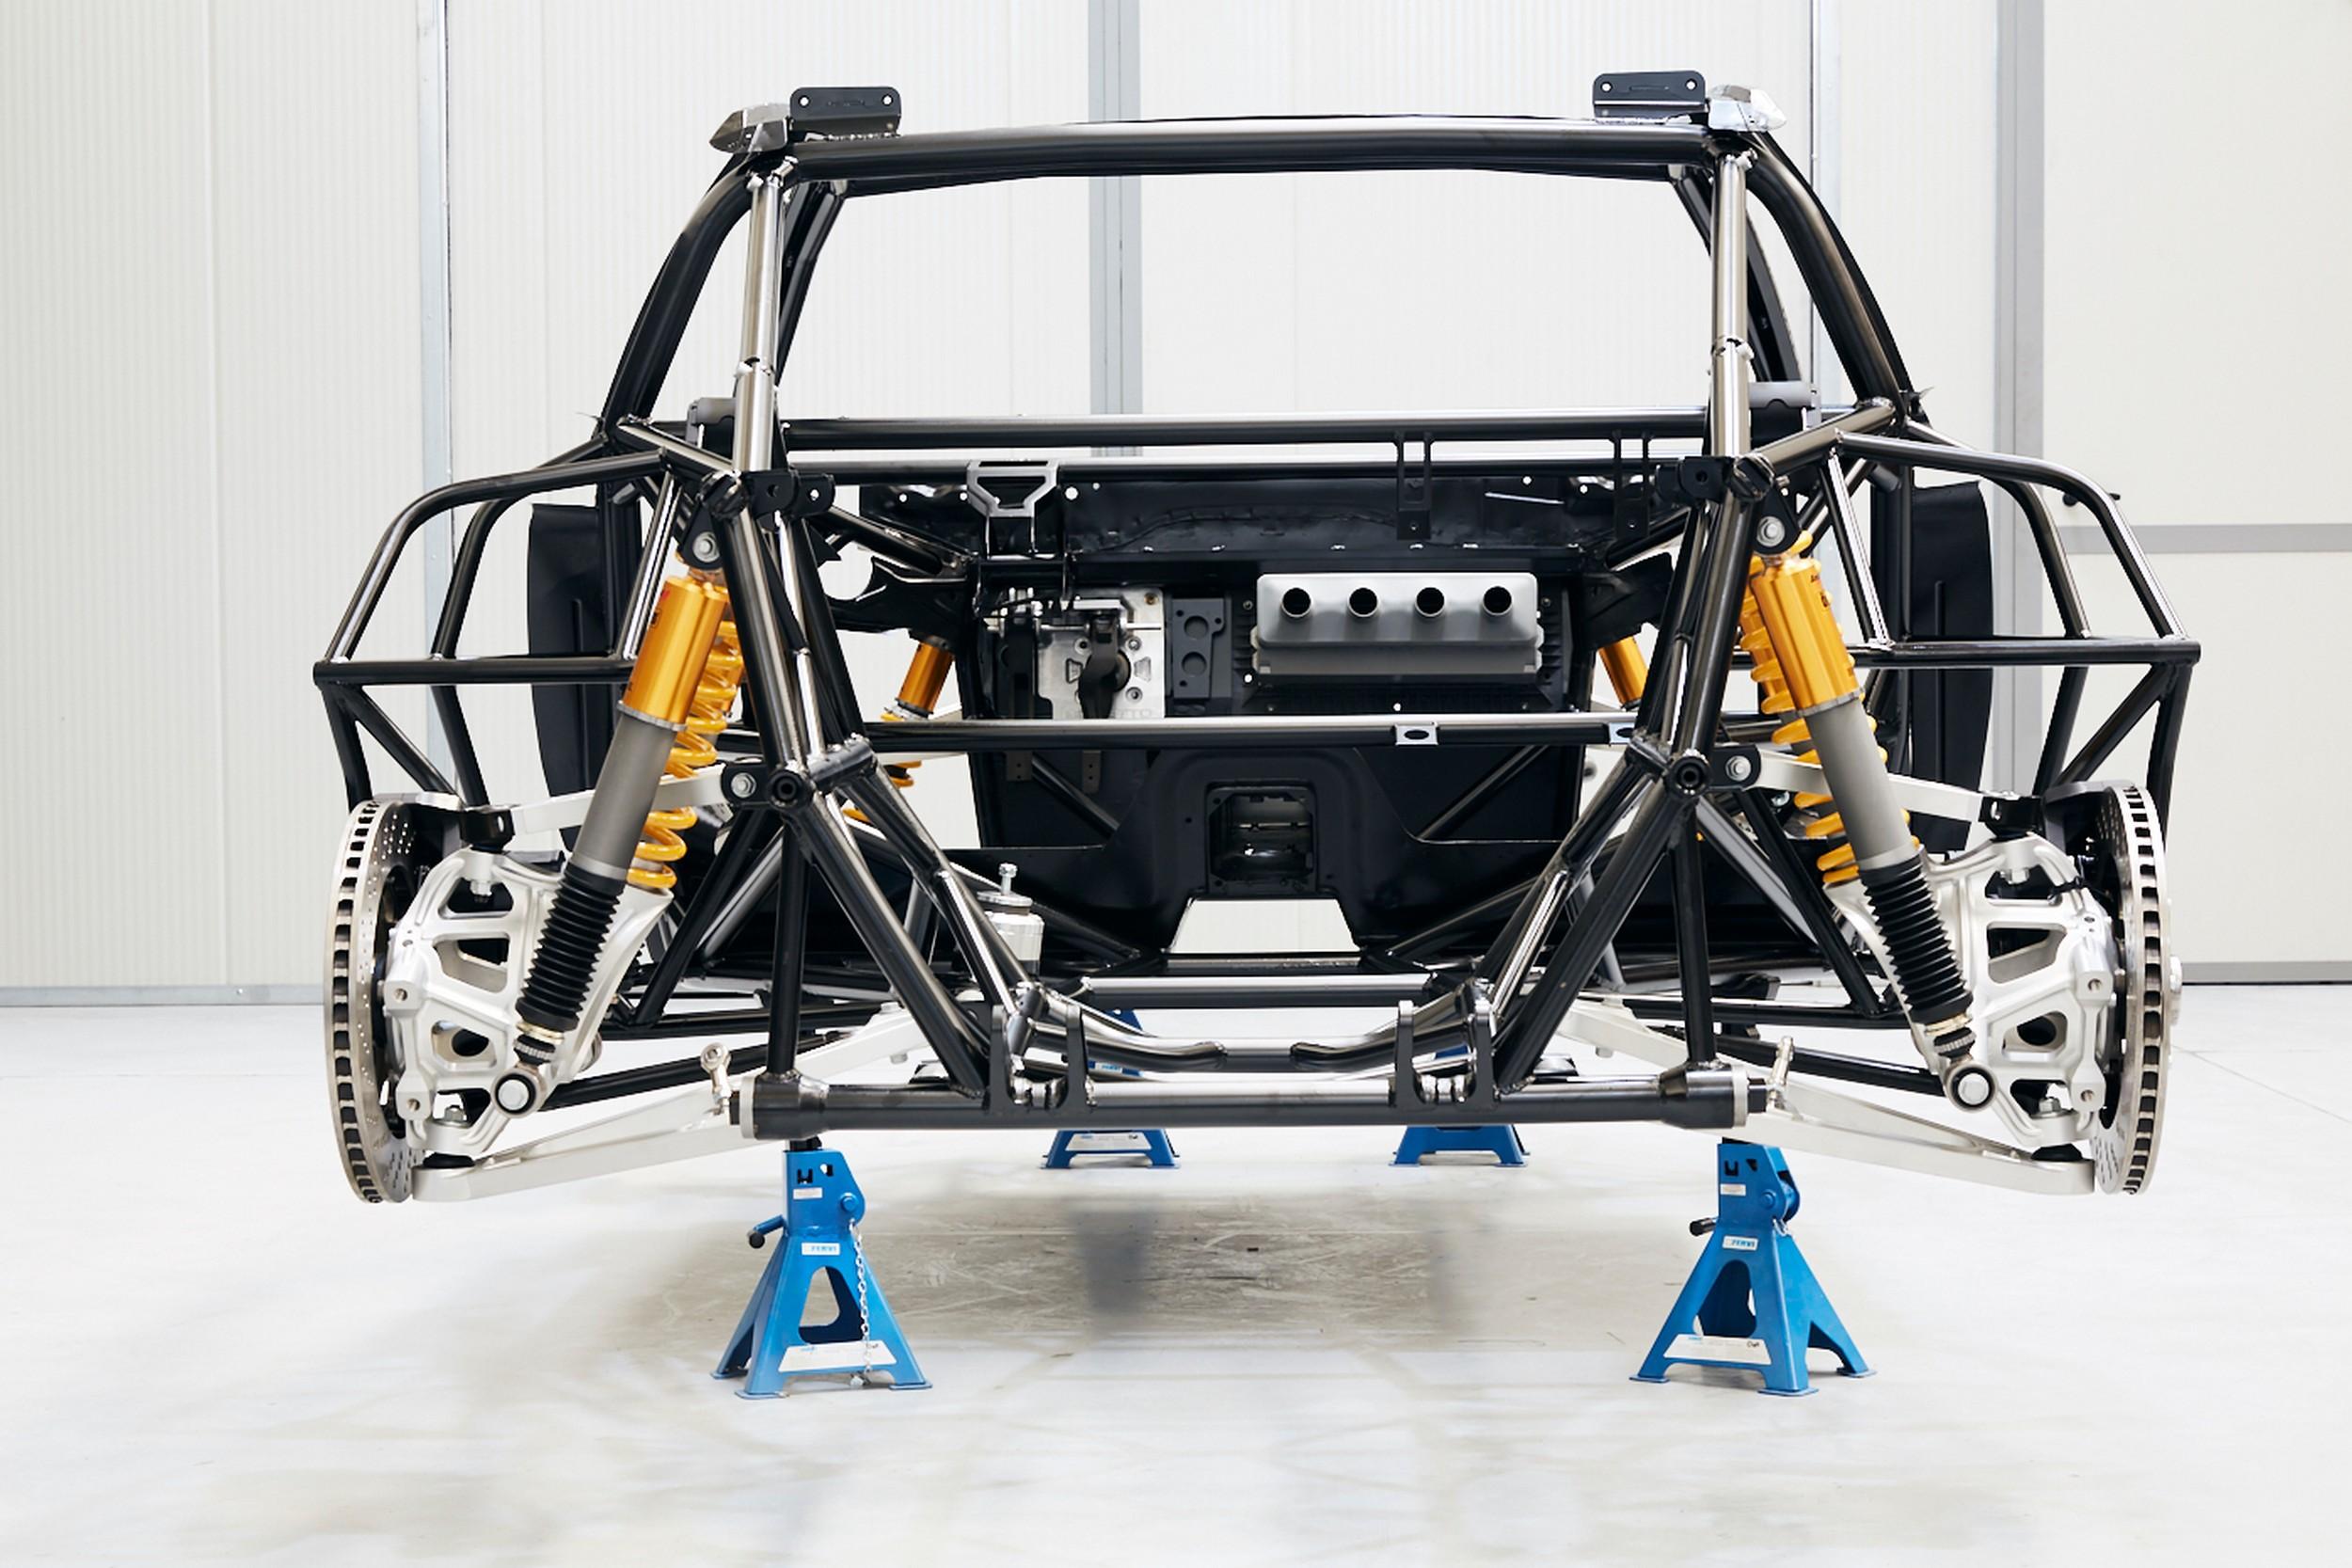 Kimera EVO37 Chassis on Display